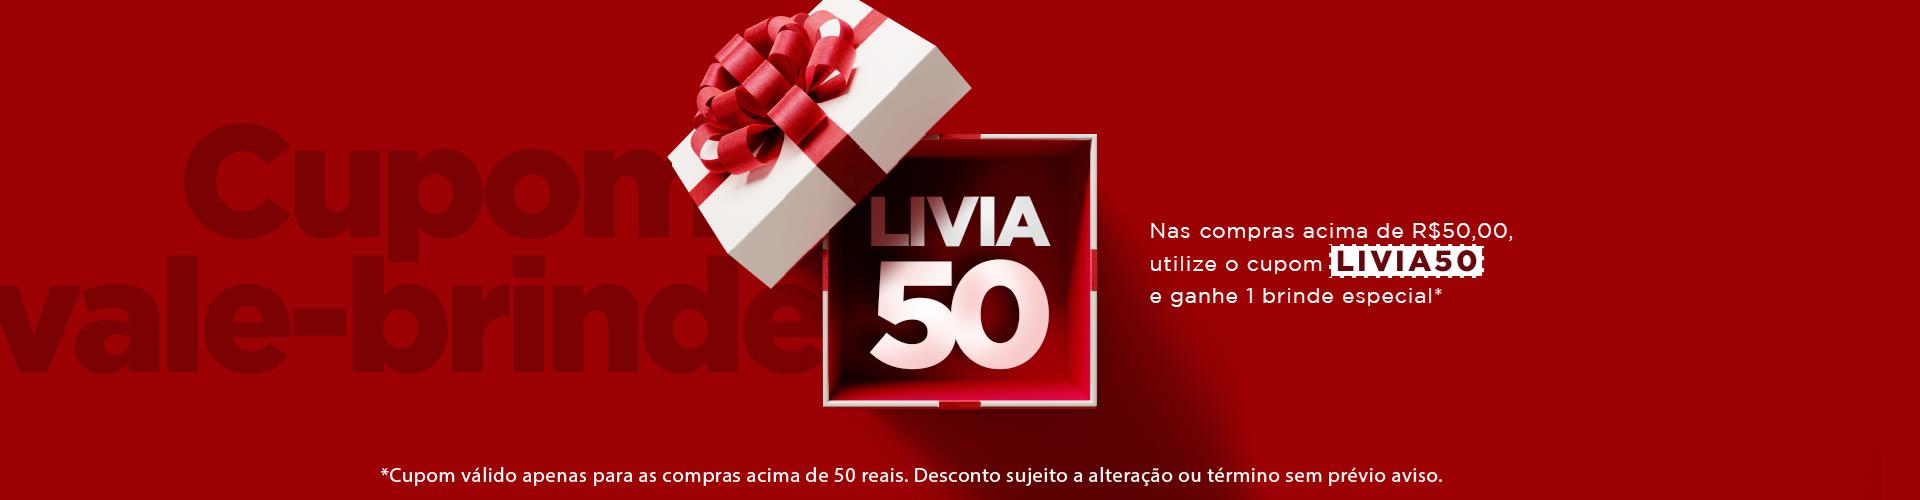 Livia 50 - Brinde